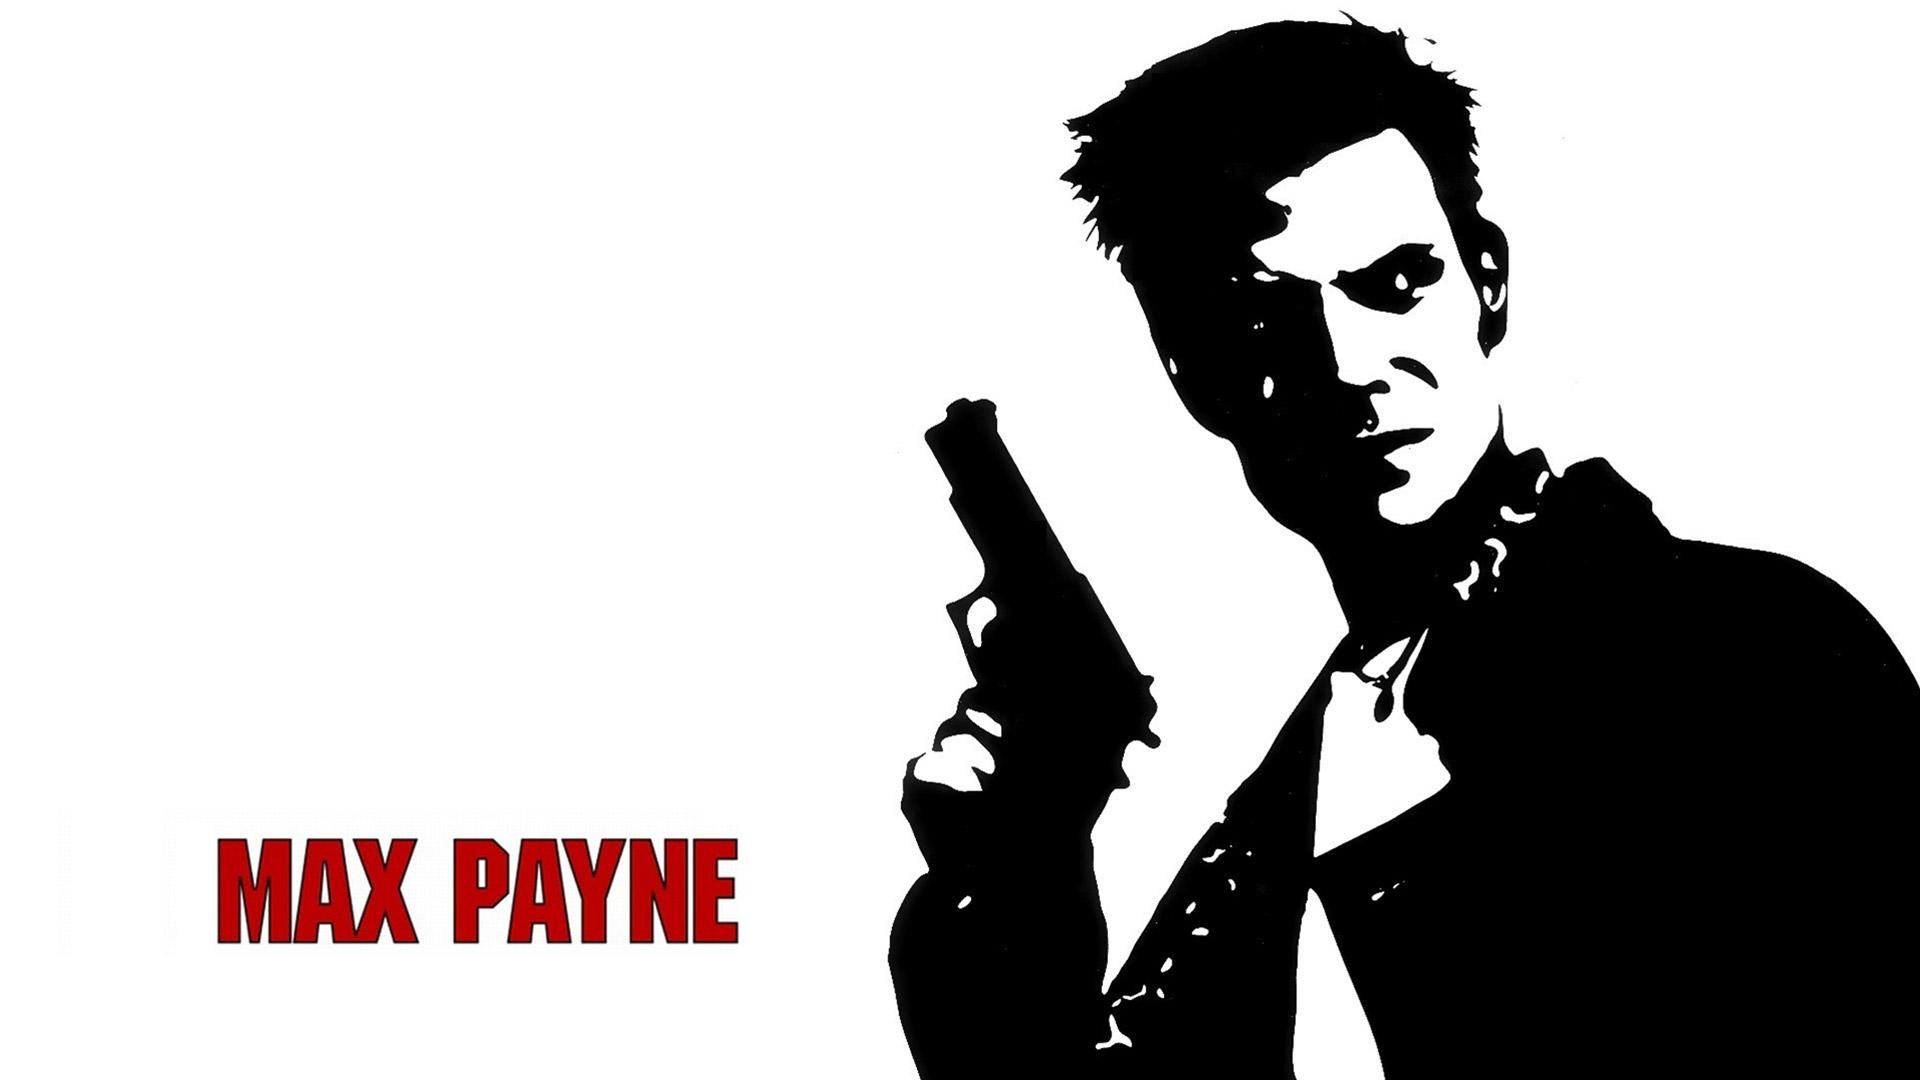 Free Max Payne Wallpaper in 1920x1080